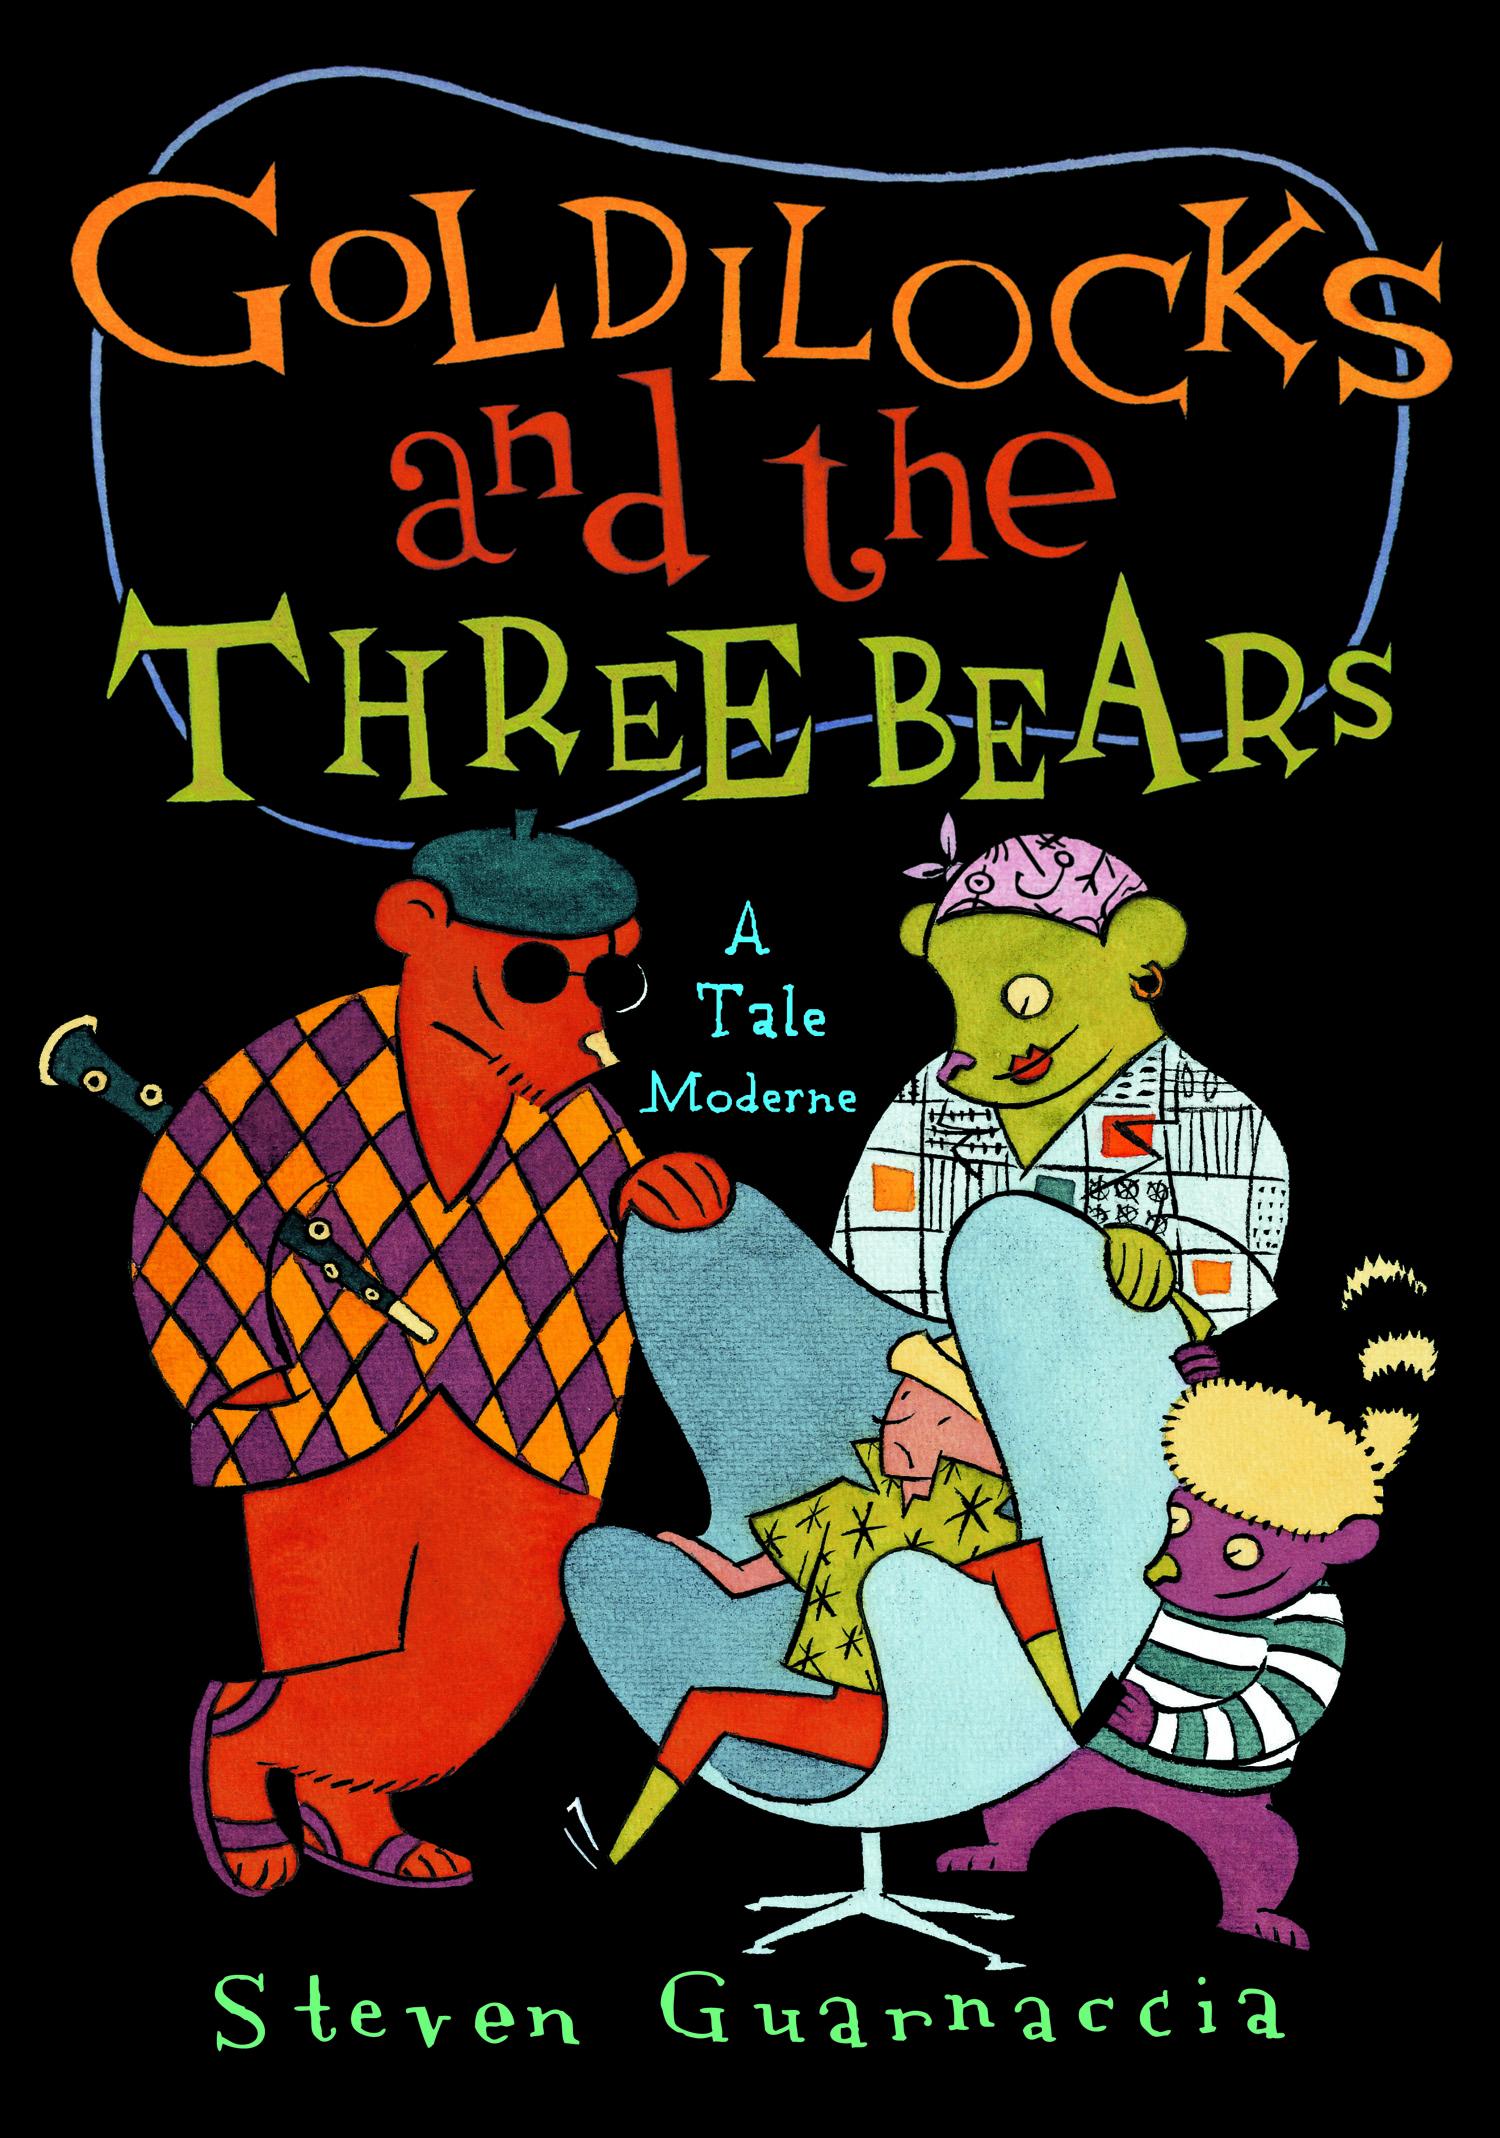 Goldilocks And The Three Bears A Tale Moderne